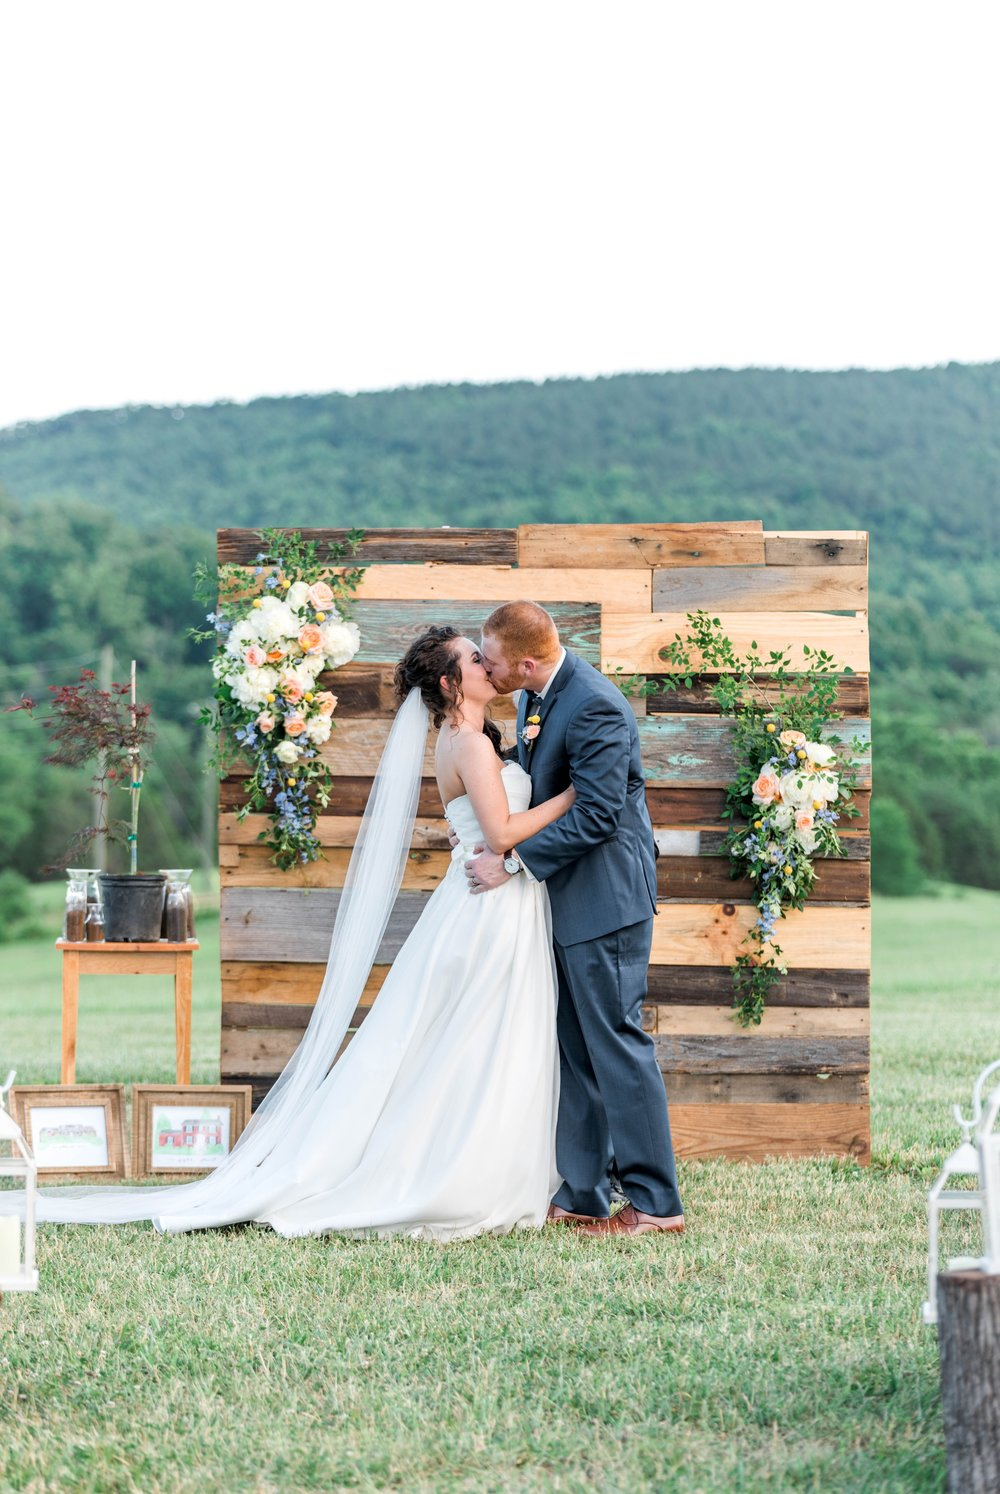 SorellaFarms_EvingtonVA_Lynchburgweddingphotographer_VirginiaweddingPhotographer_AshleyAndrewSorellaFarmsWedding 50.jpg